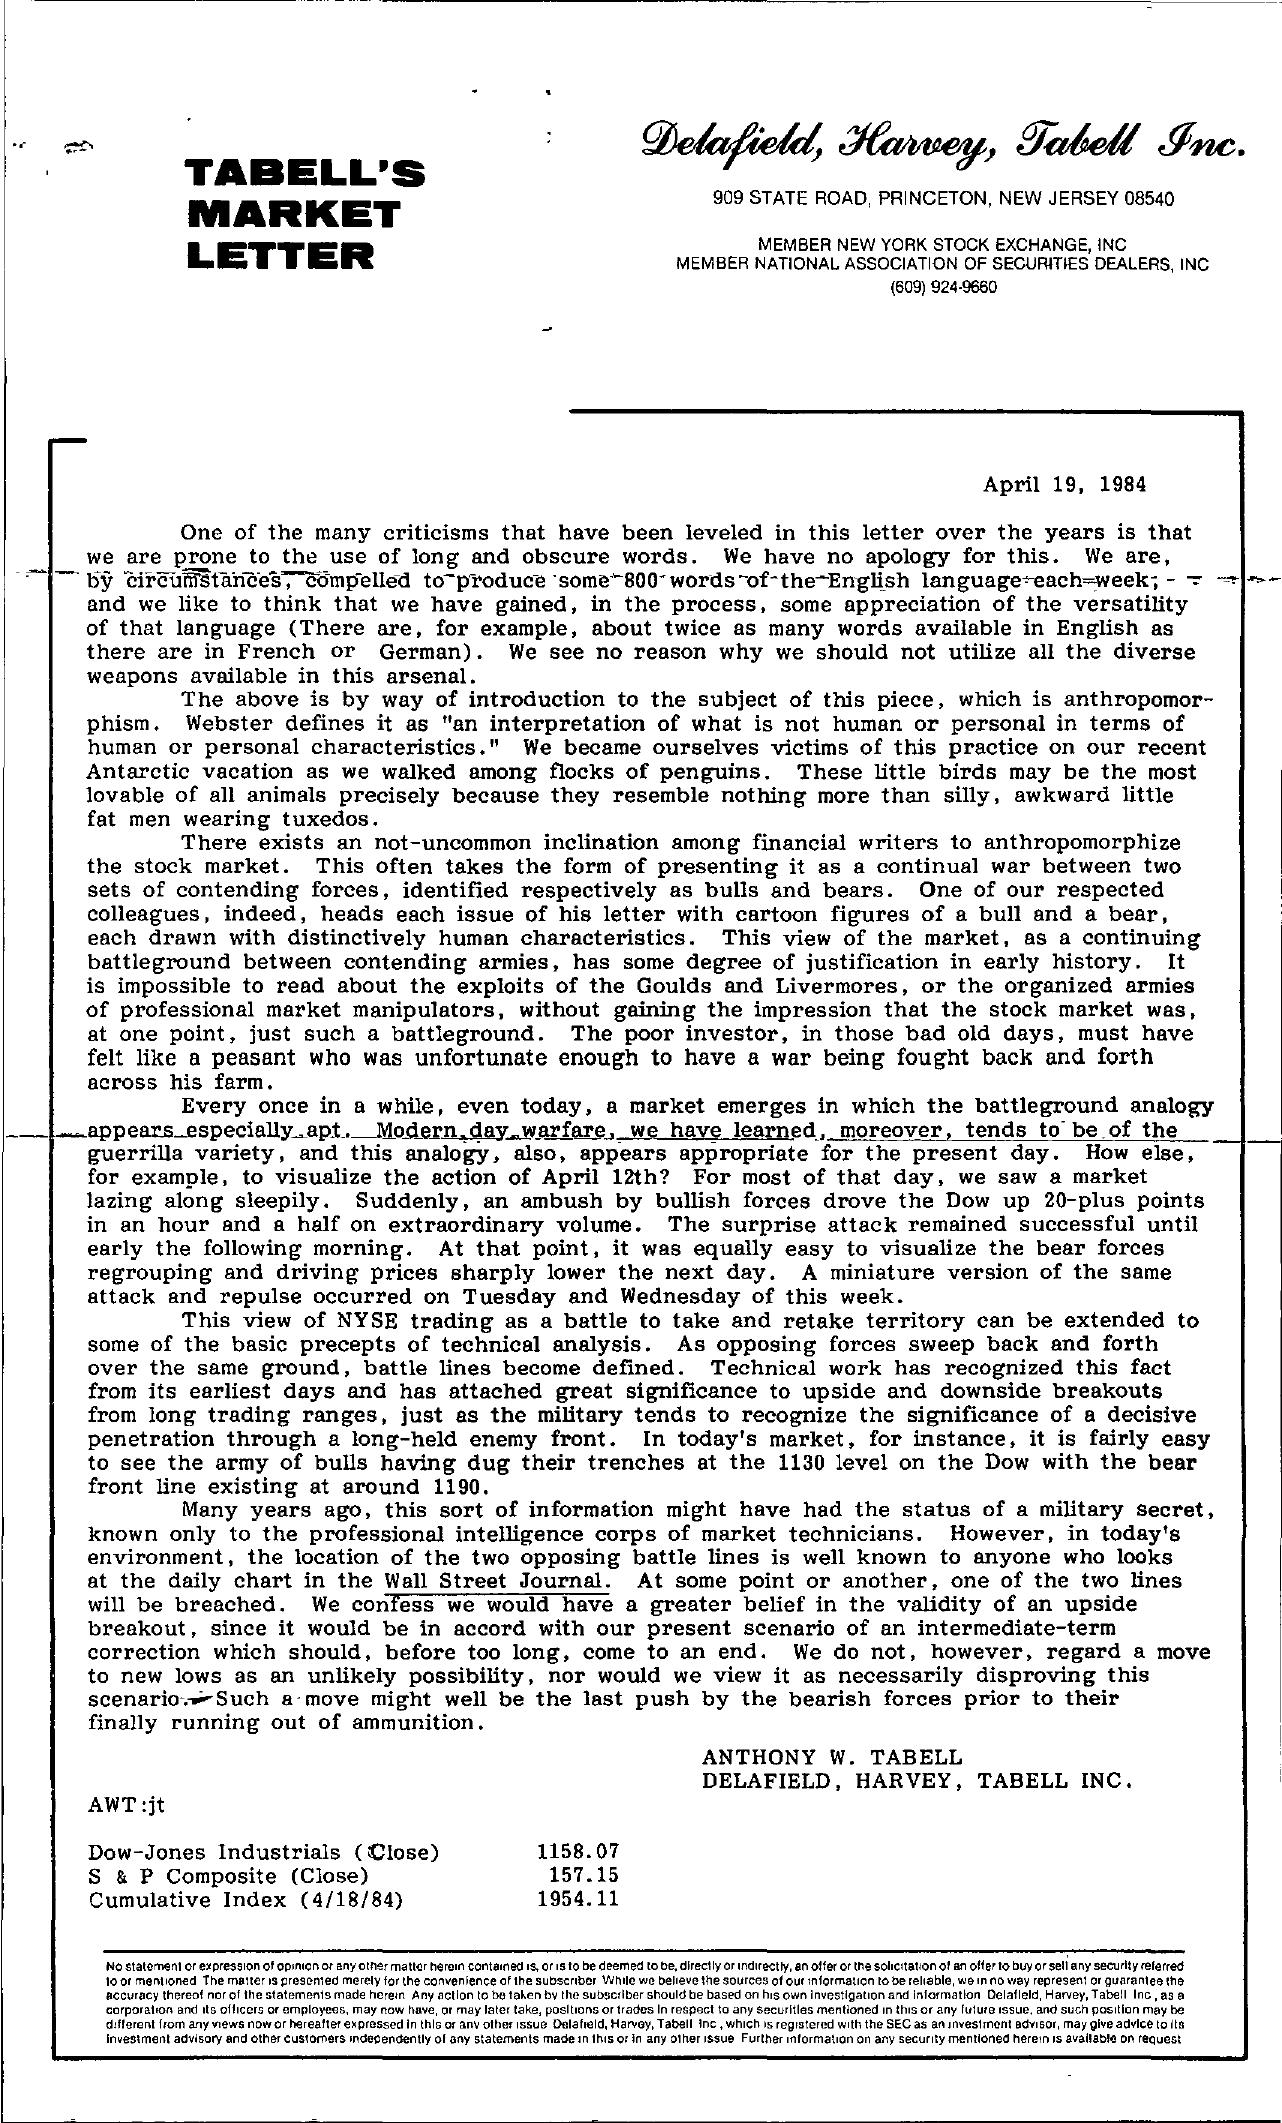 Tabell's Market Letter - April 19, 1984